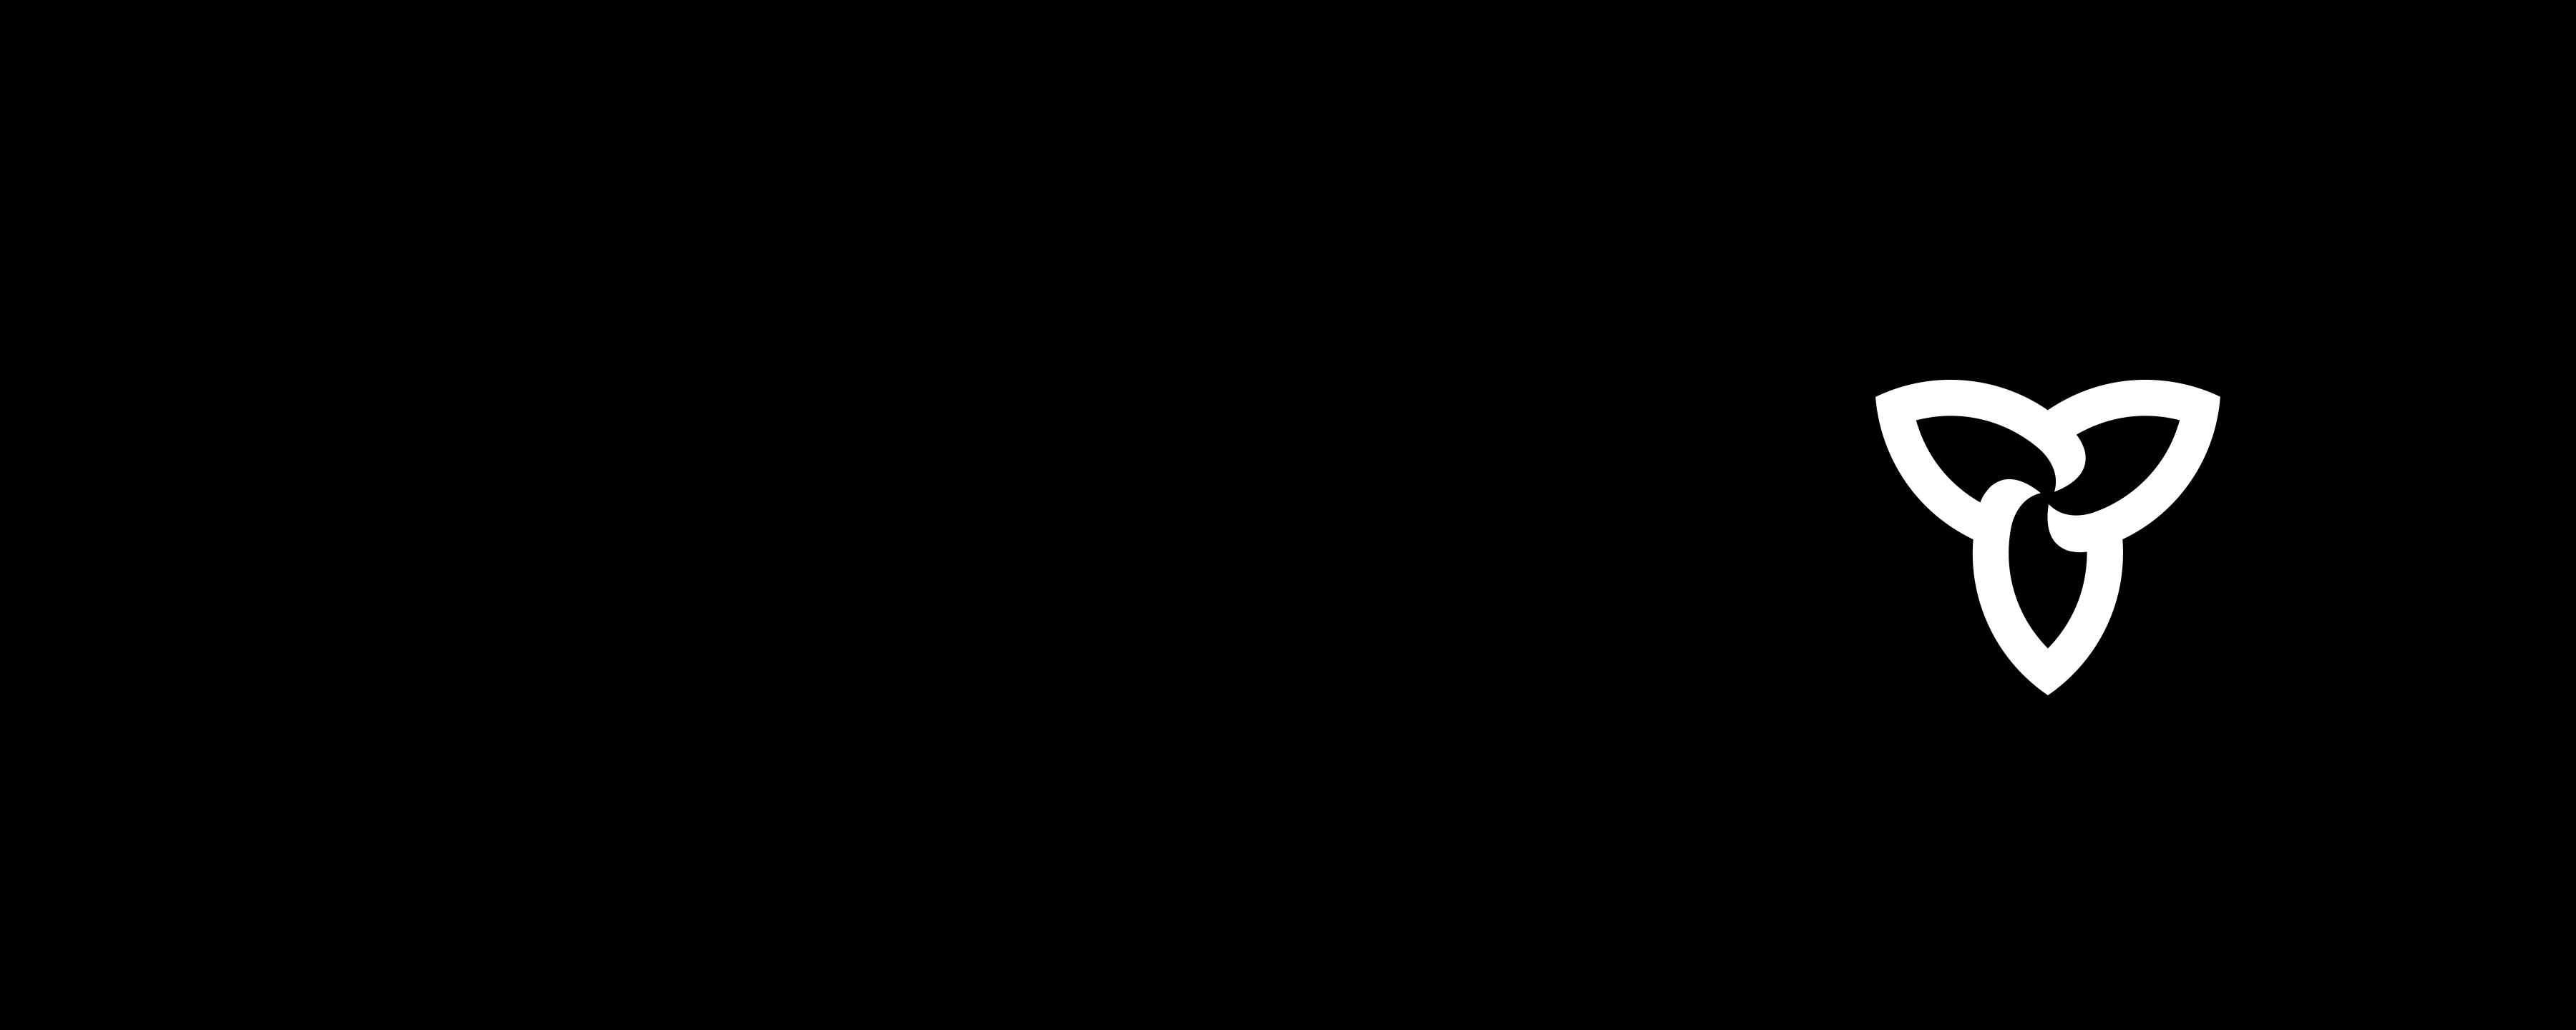 ON_POS_LOGO_RGB